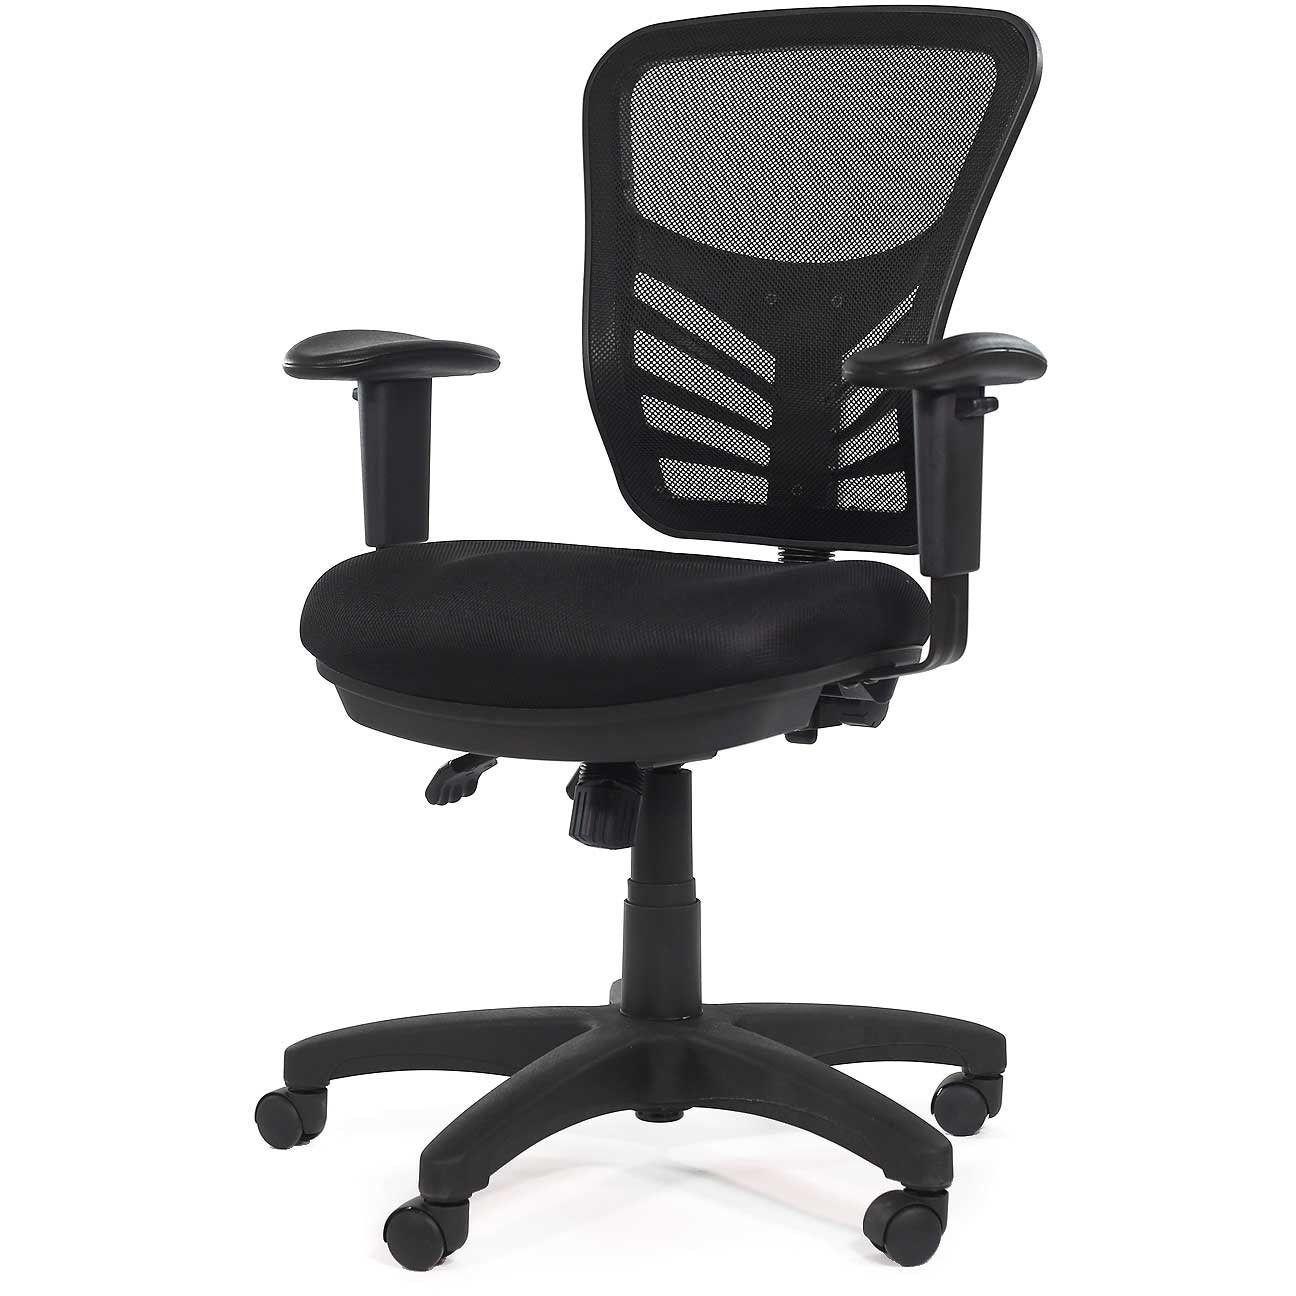 ergonomic mid back multyfuntion task computer chair with mesh back rh za pinterest com